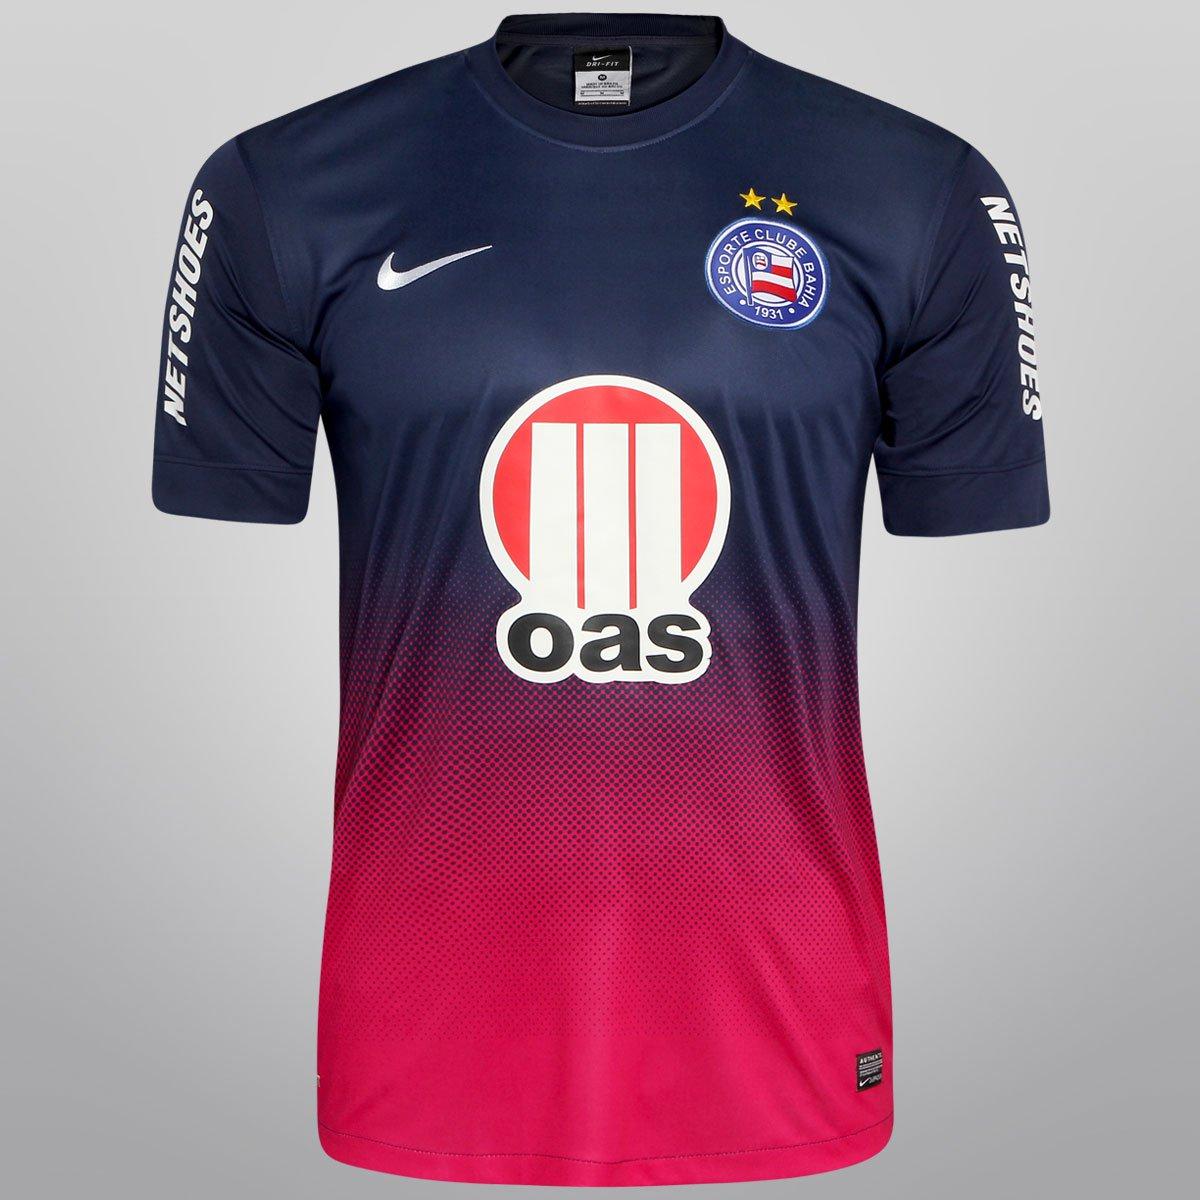 Camisa Nike Bahia III 13 14 s nº - c  Patrocínio - Compre Agora ... 594ffe887cffc